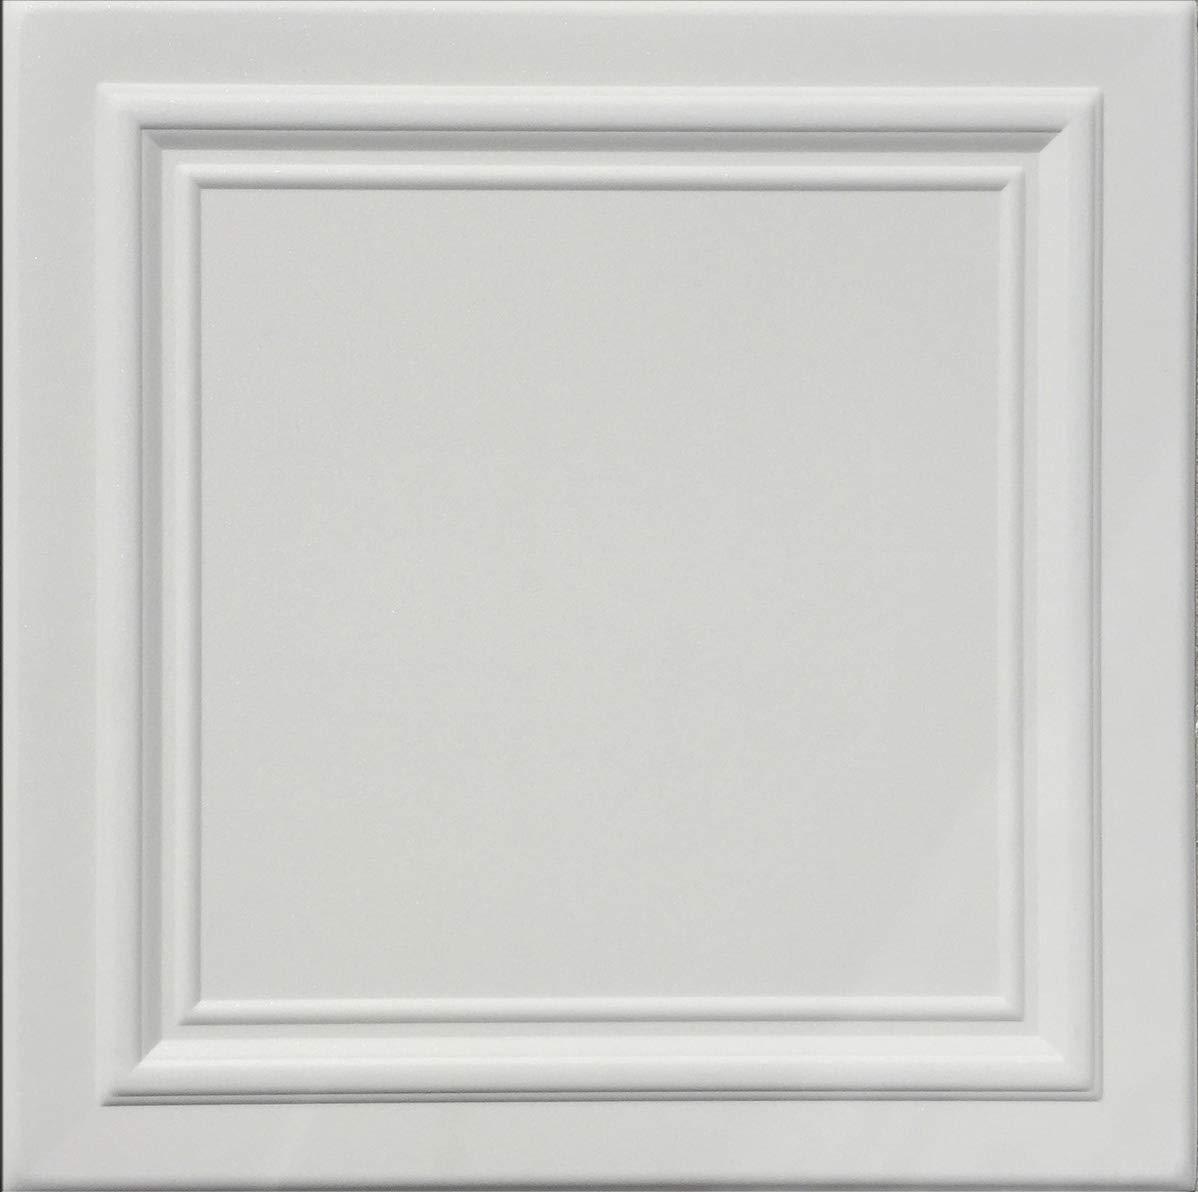 Zeta White (Foam) Ceiling Tile - 100pc Box - Decorative Ceiling Tile Easy Glue up DIY by Antique Ceilings (Image #1)